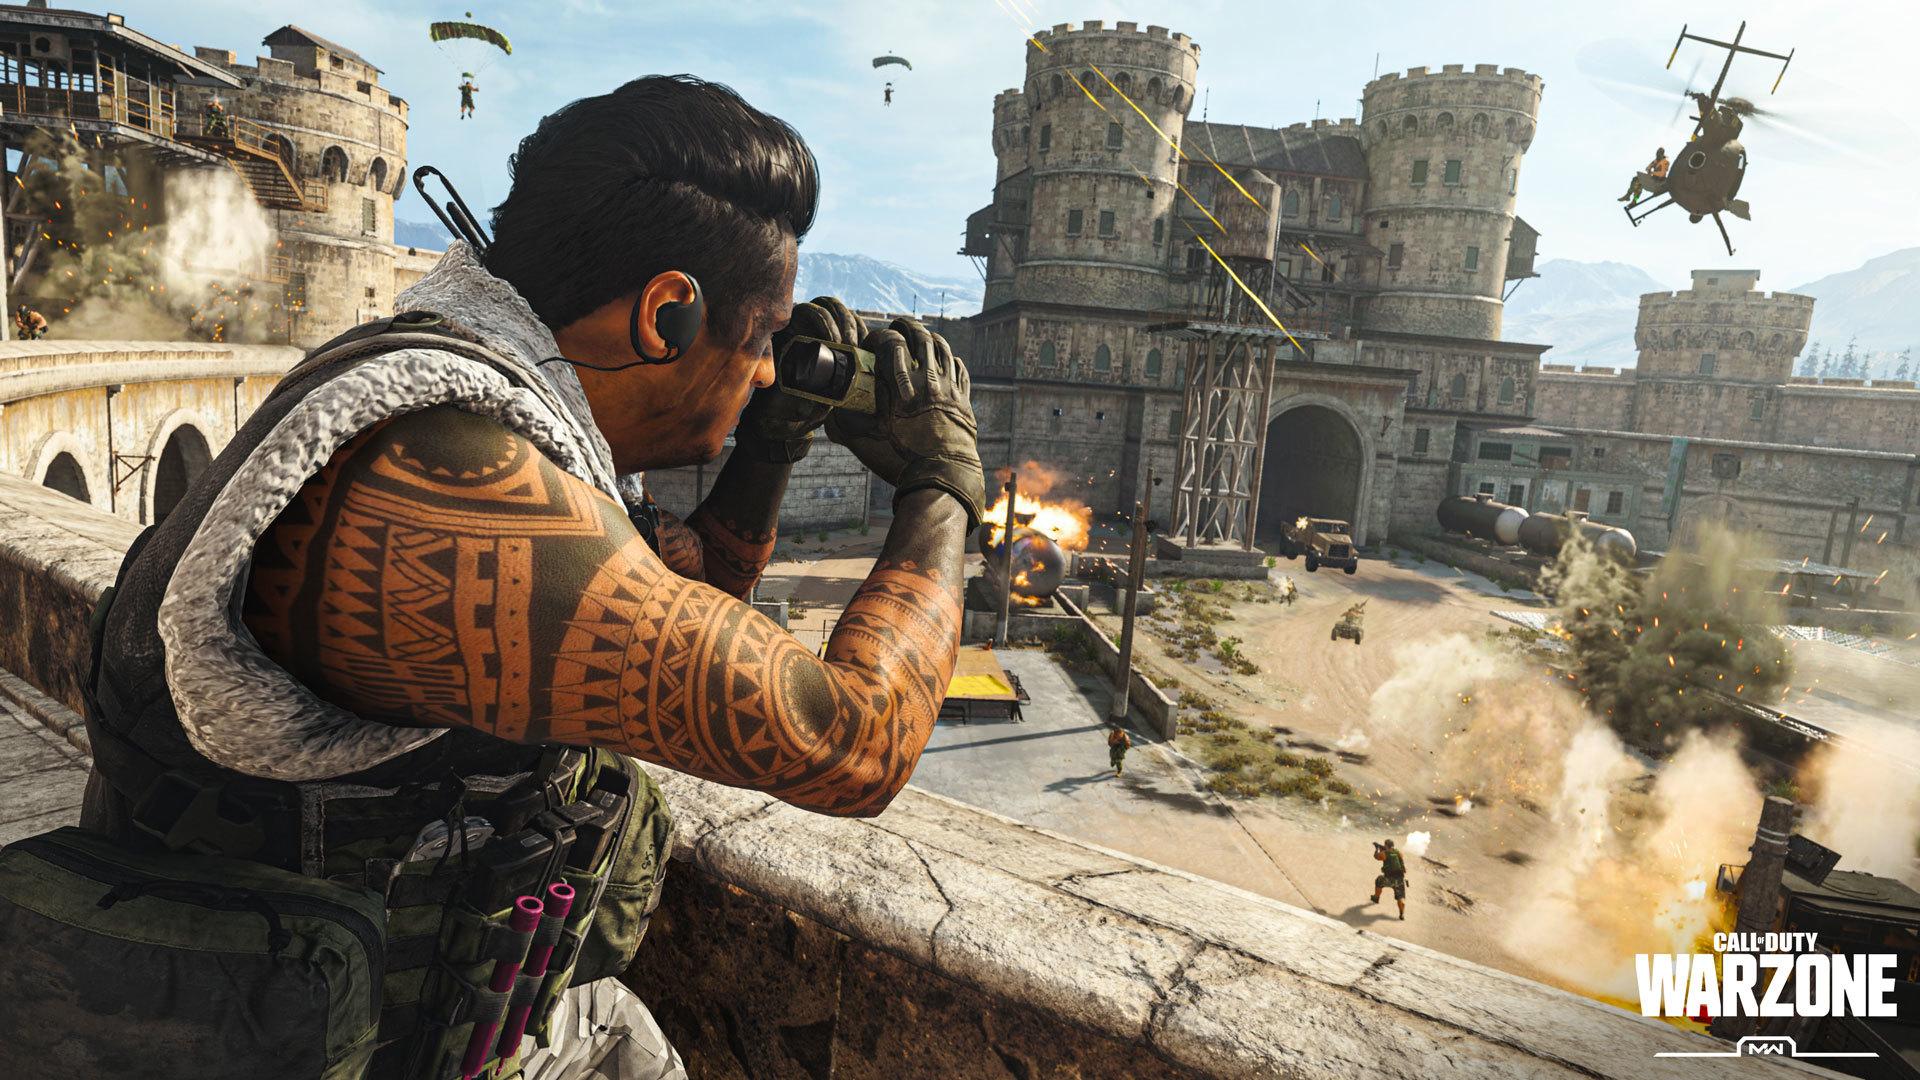 Call of Duty Warzone prison.